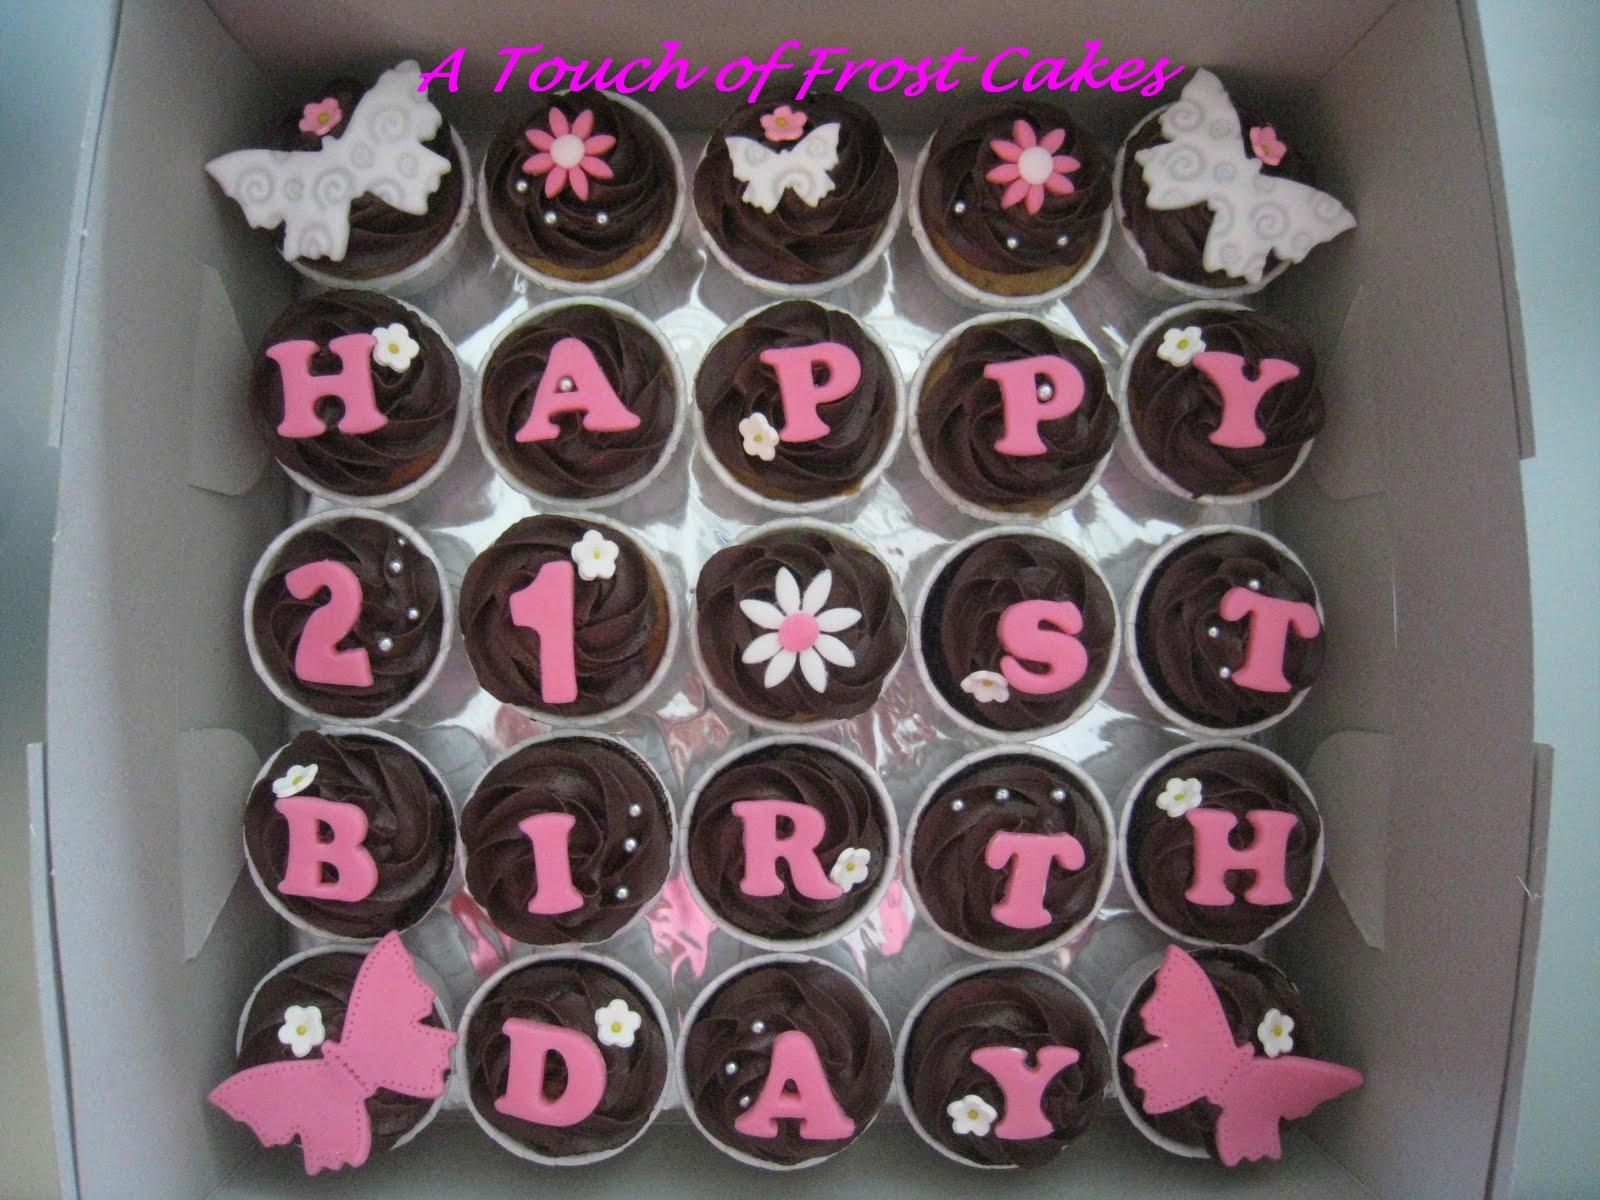 12 for her 21st birthday cupcakes photo - 21st birthday cupcake